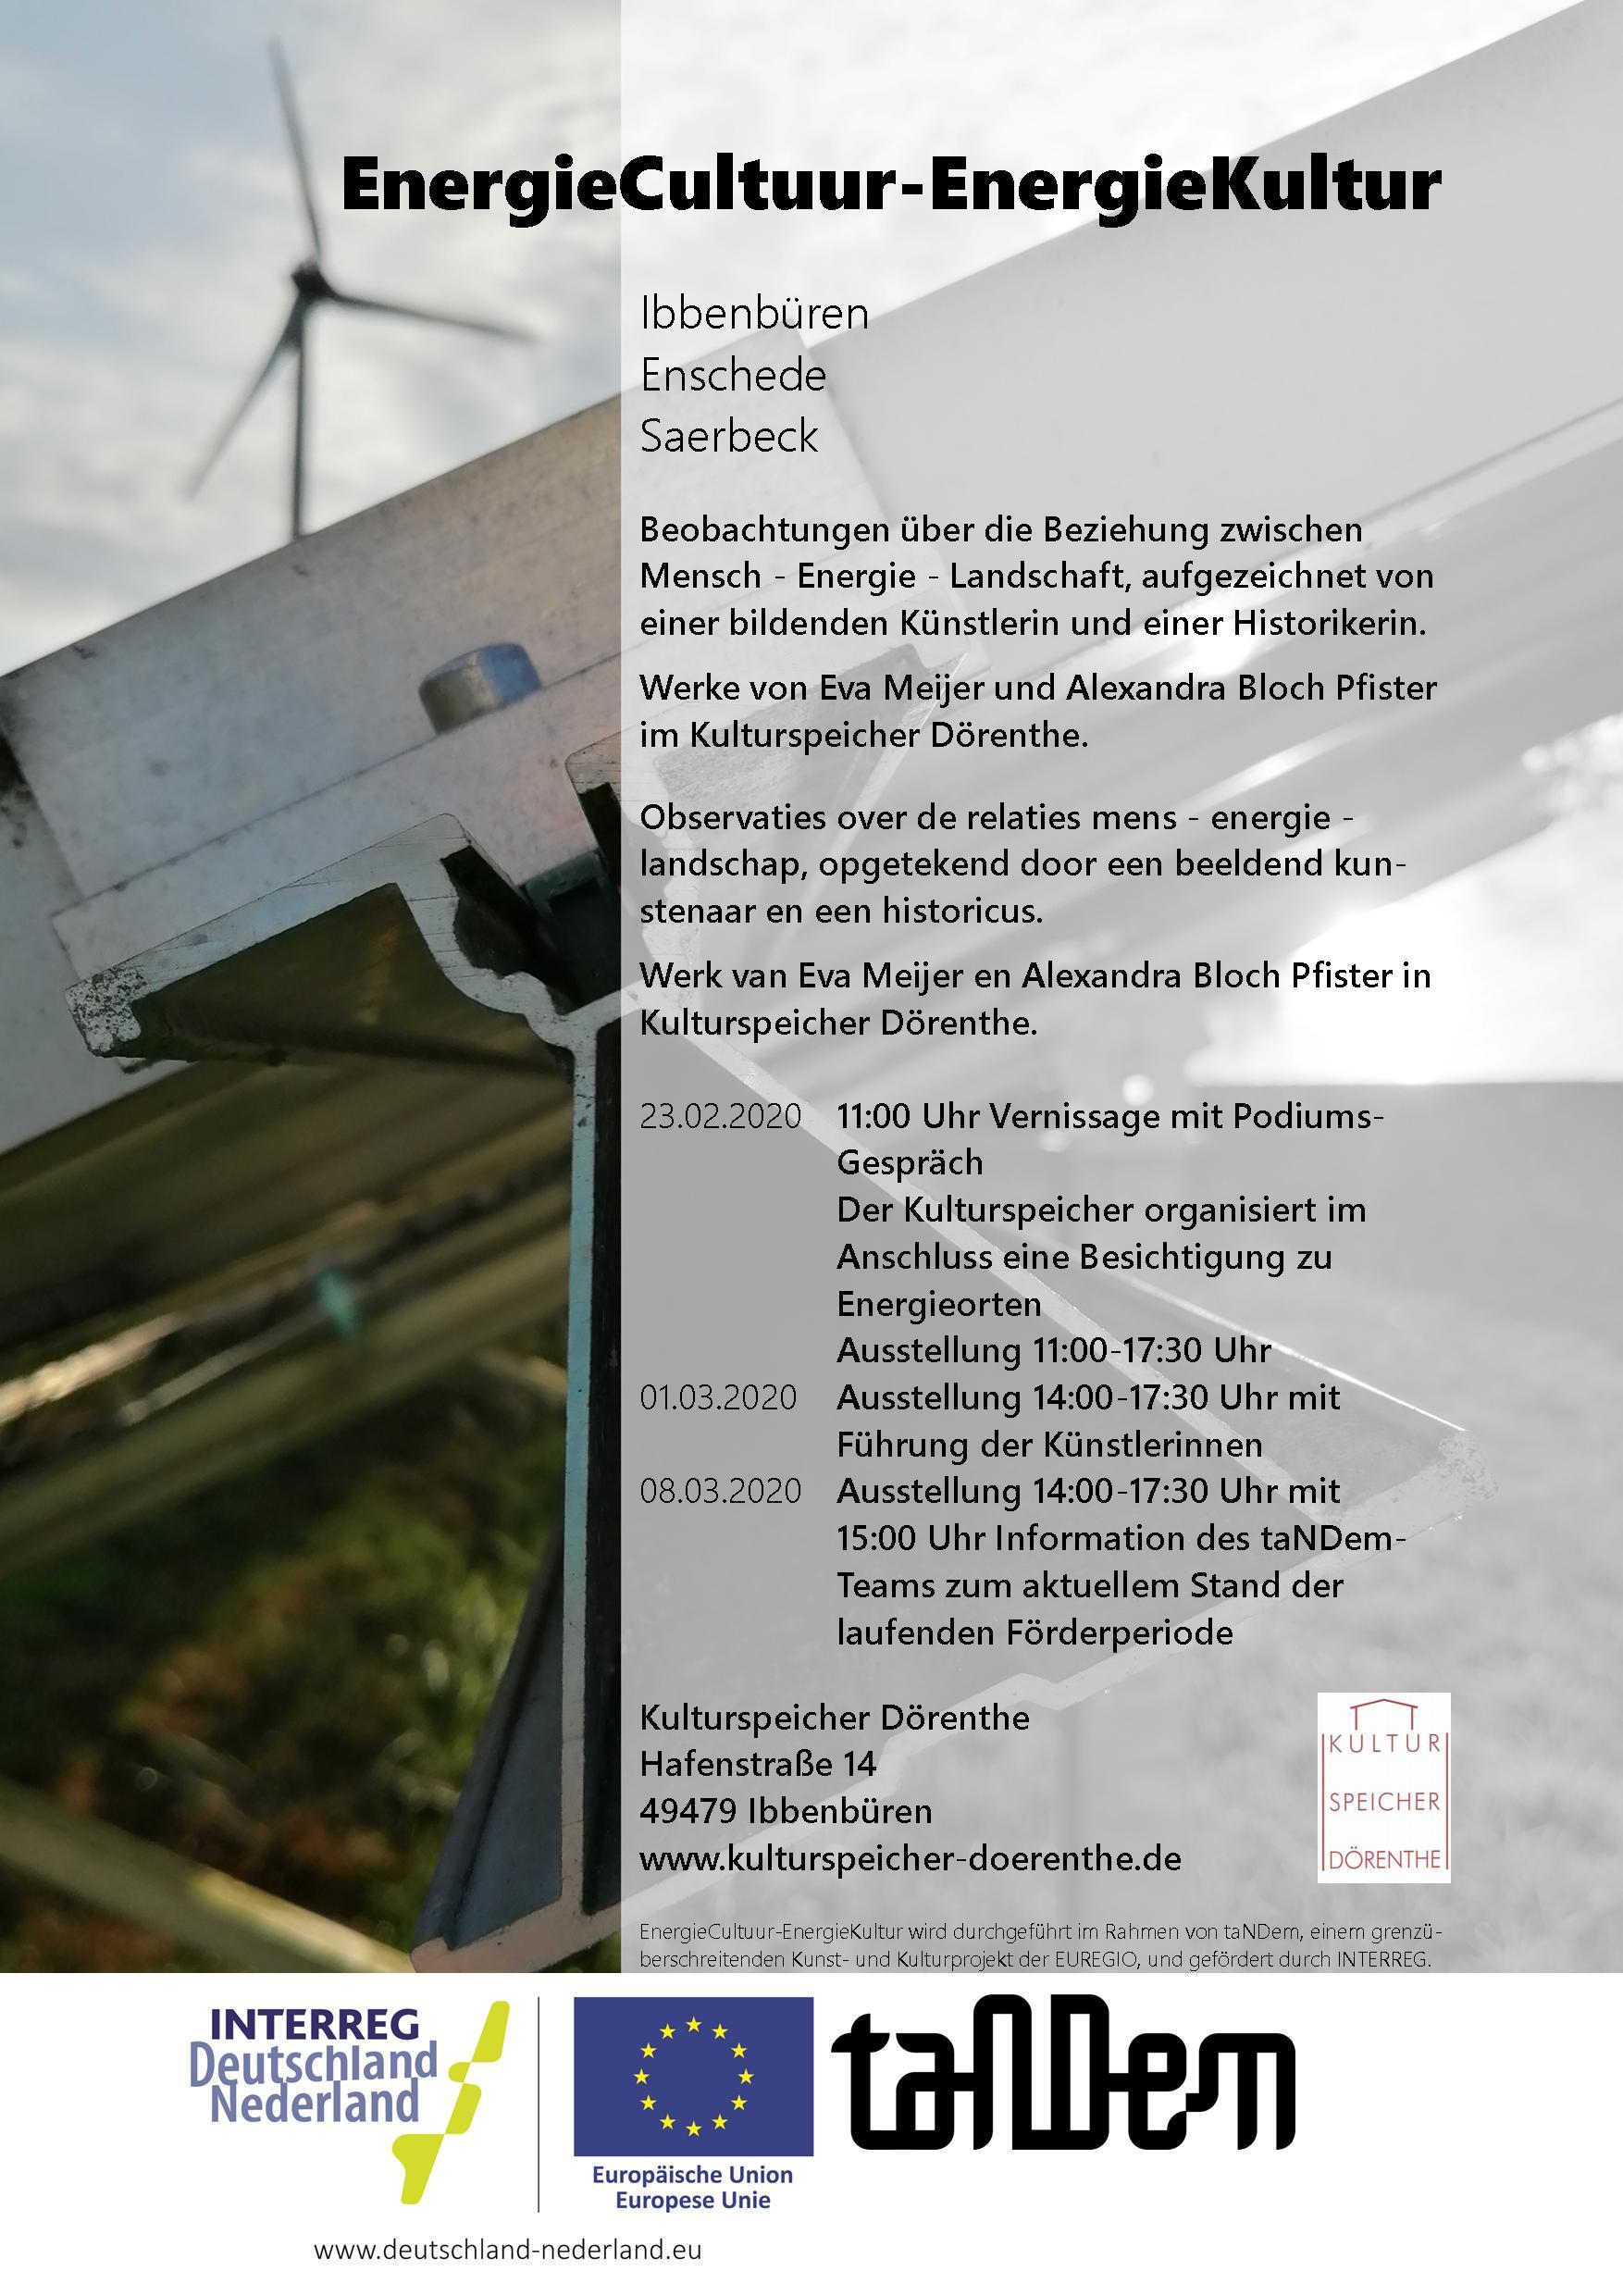 Ausstellung energieCultuur-EnergieKultur